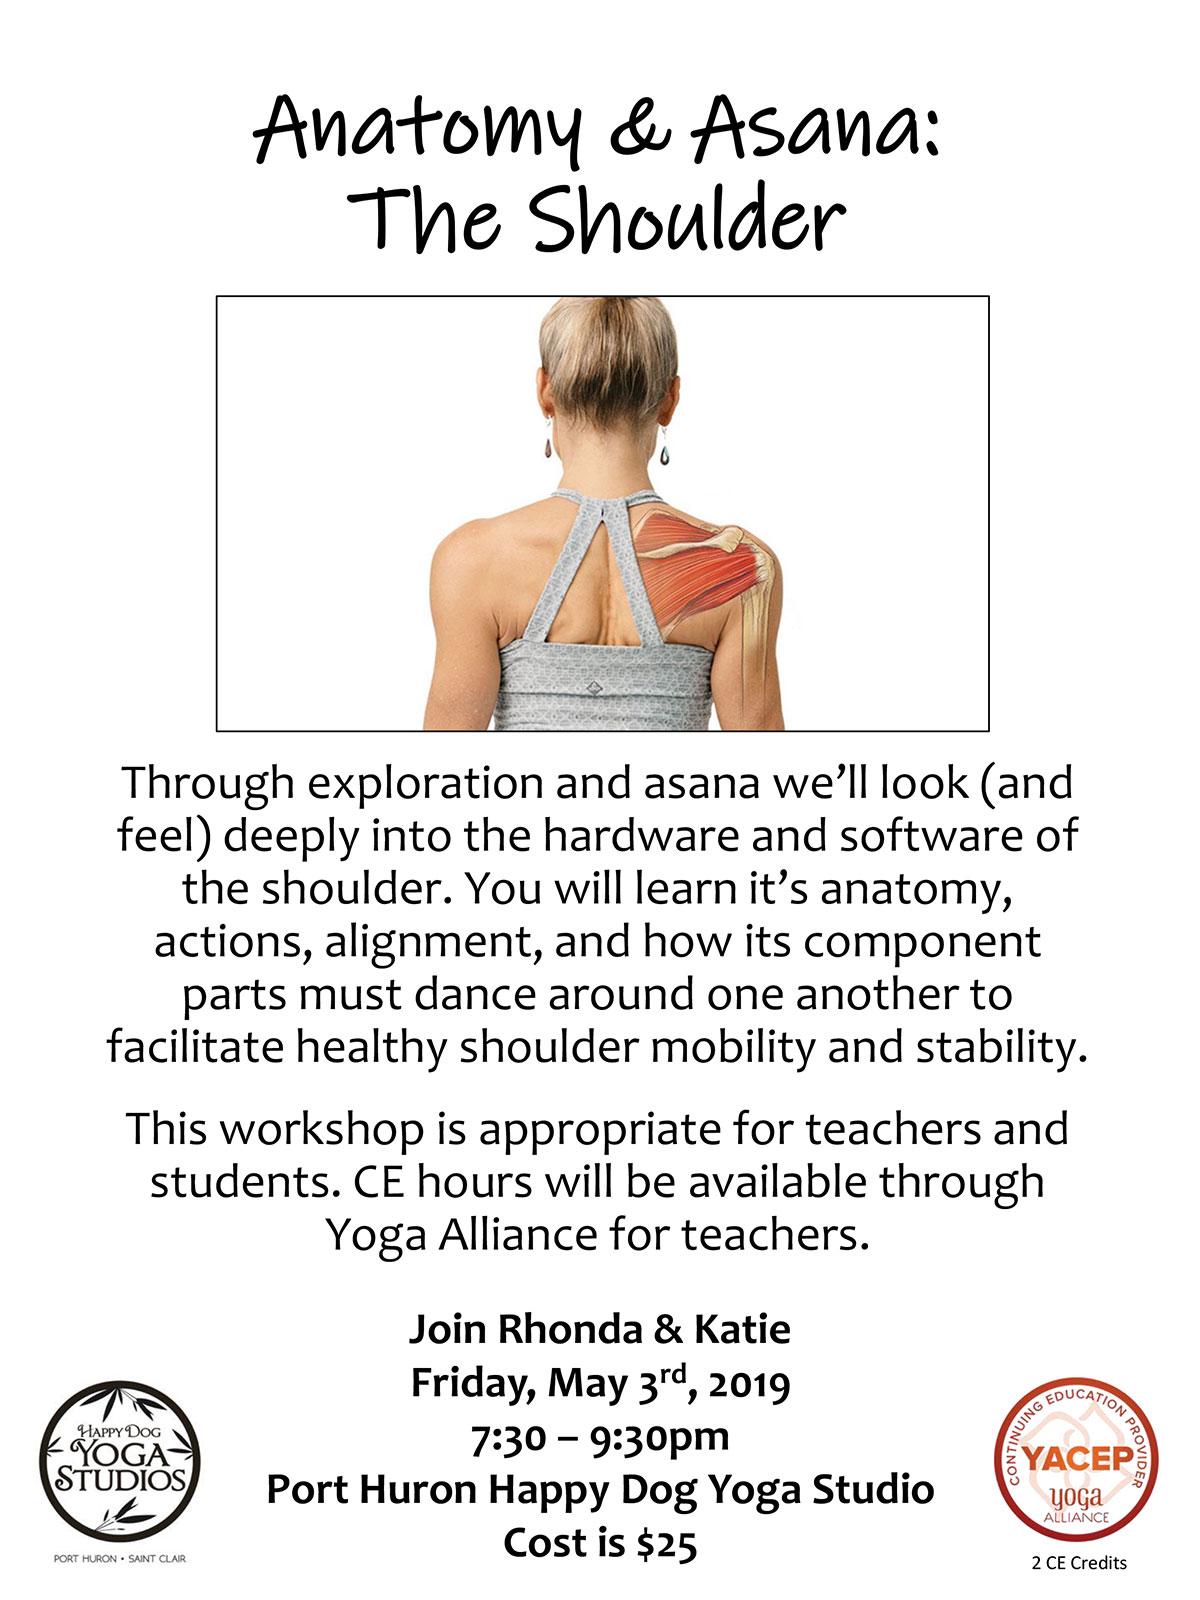 Anatomy & Asana: The Shoulder